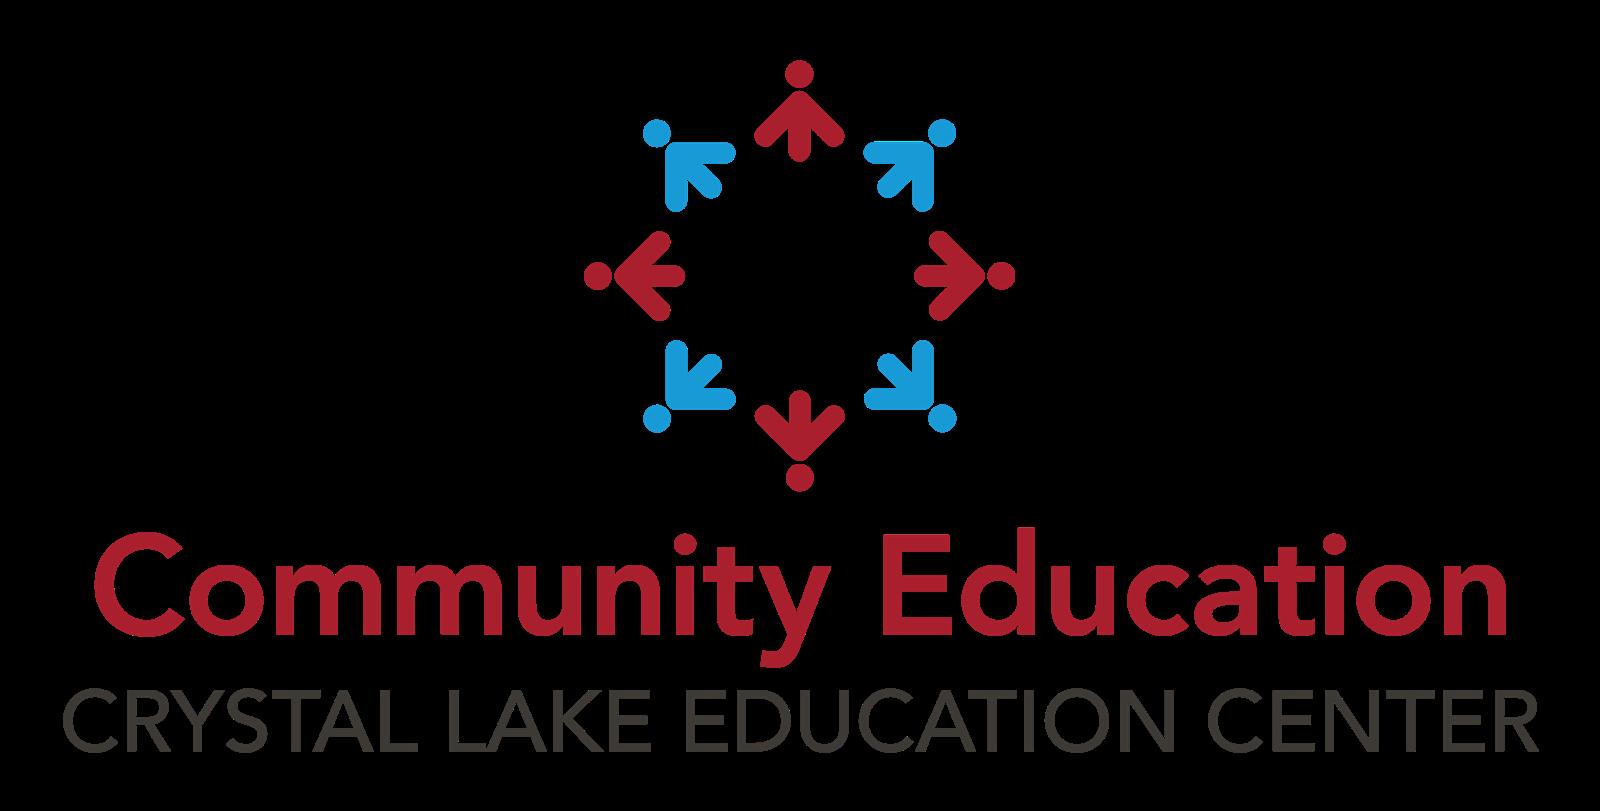 Crystal Lake Education Center